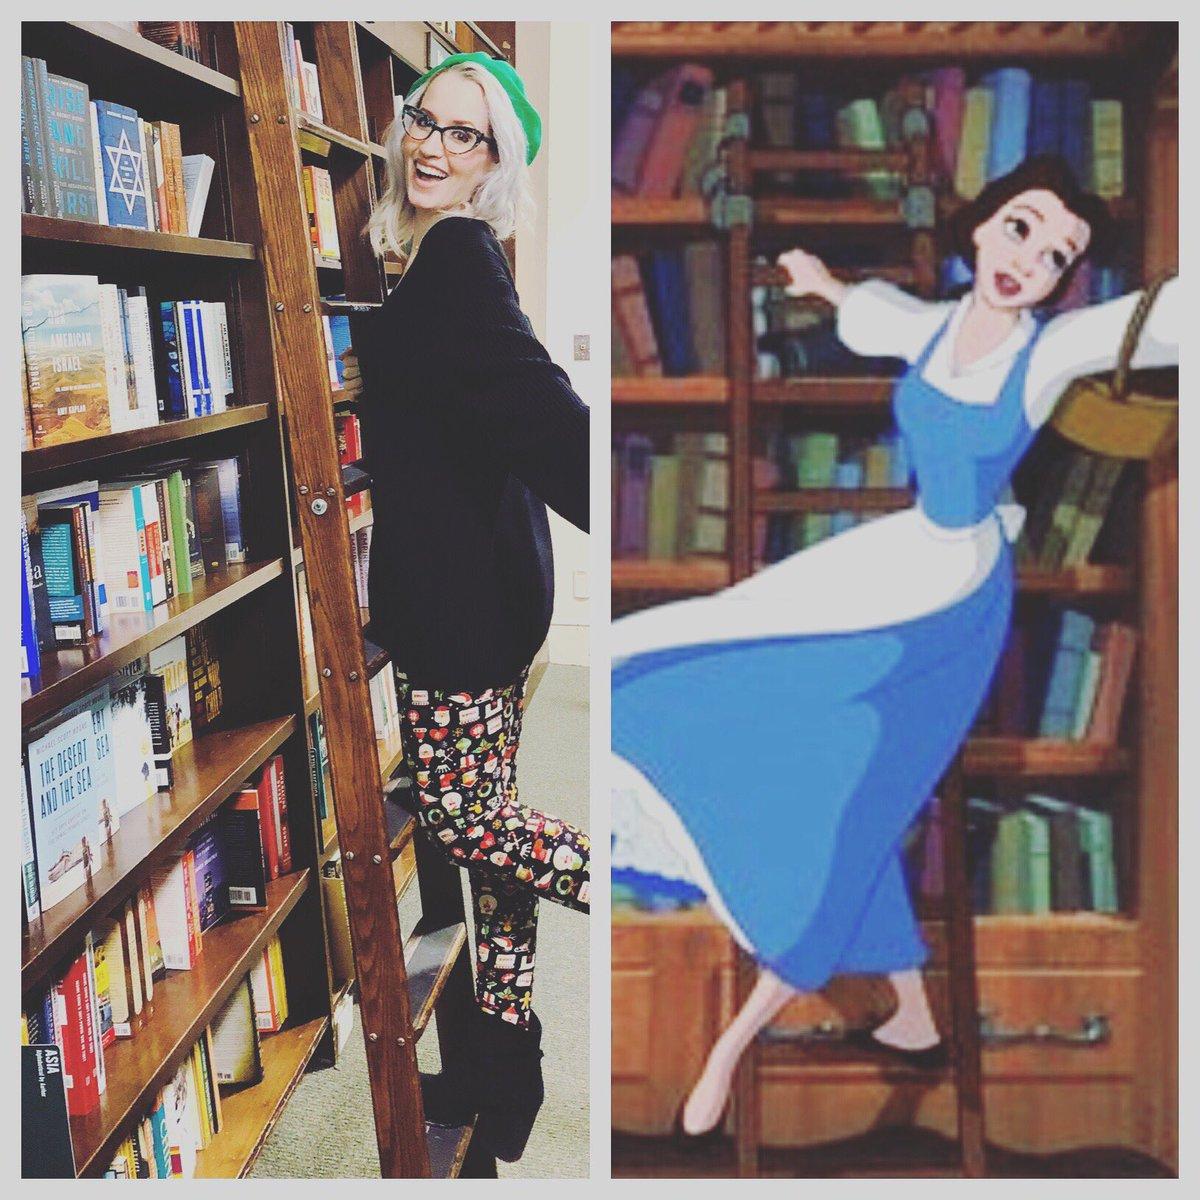 Ingrid Michaelson On Twitter When I See A Ladder And Bookshelf Gotta Do My Best Belle